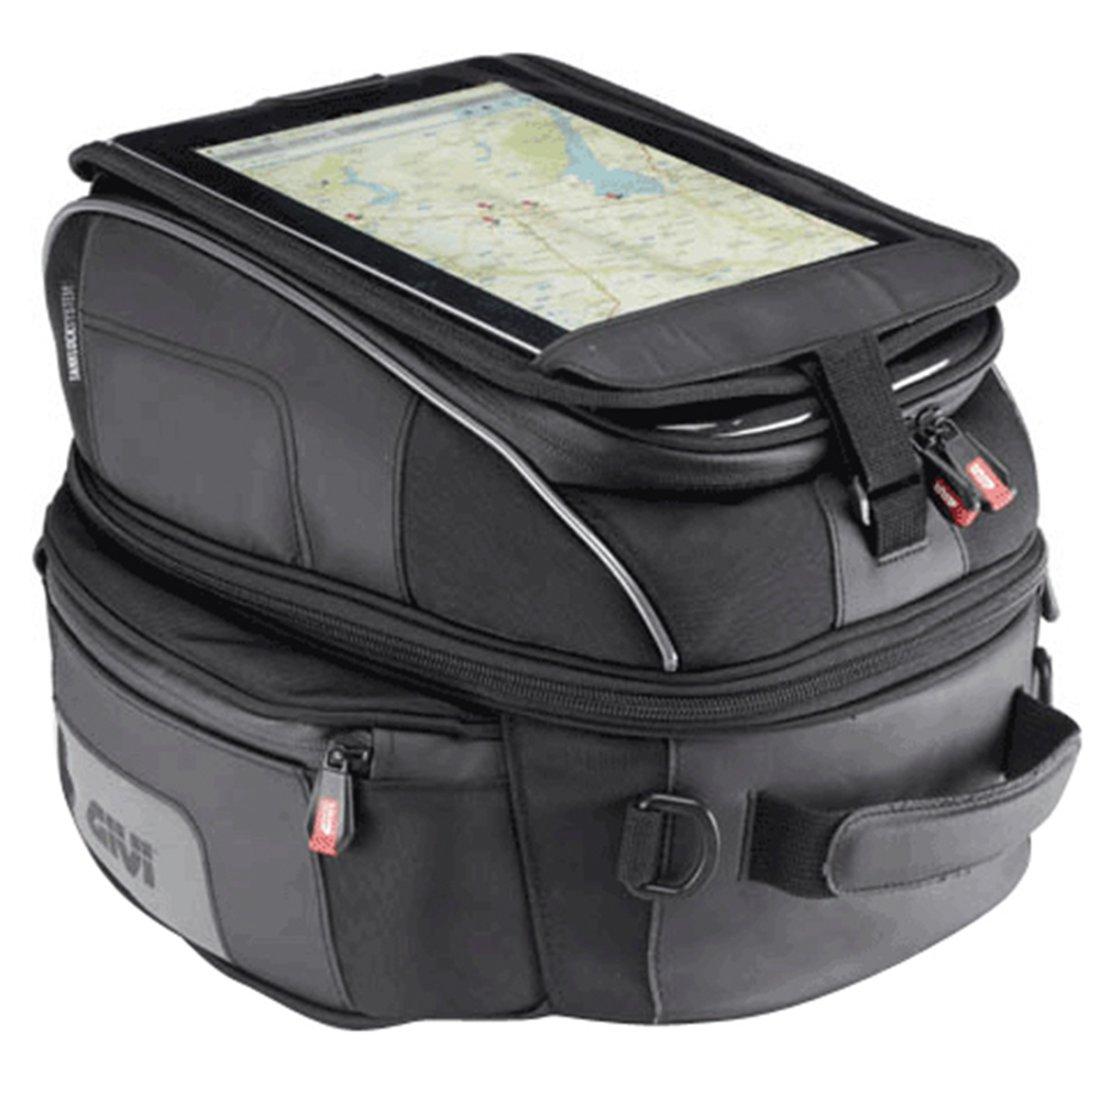 7982896f9e929 GIVI XS306 TANKLOCK Bag · Motocard